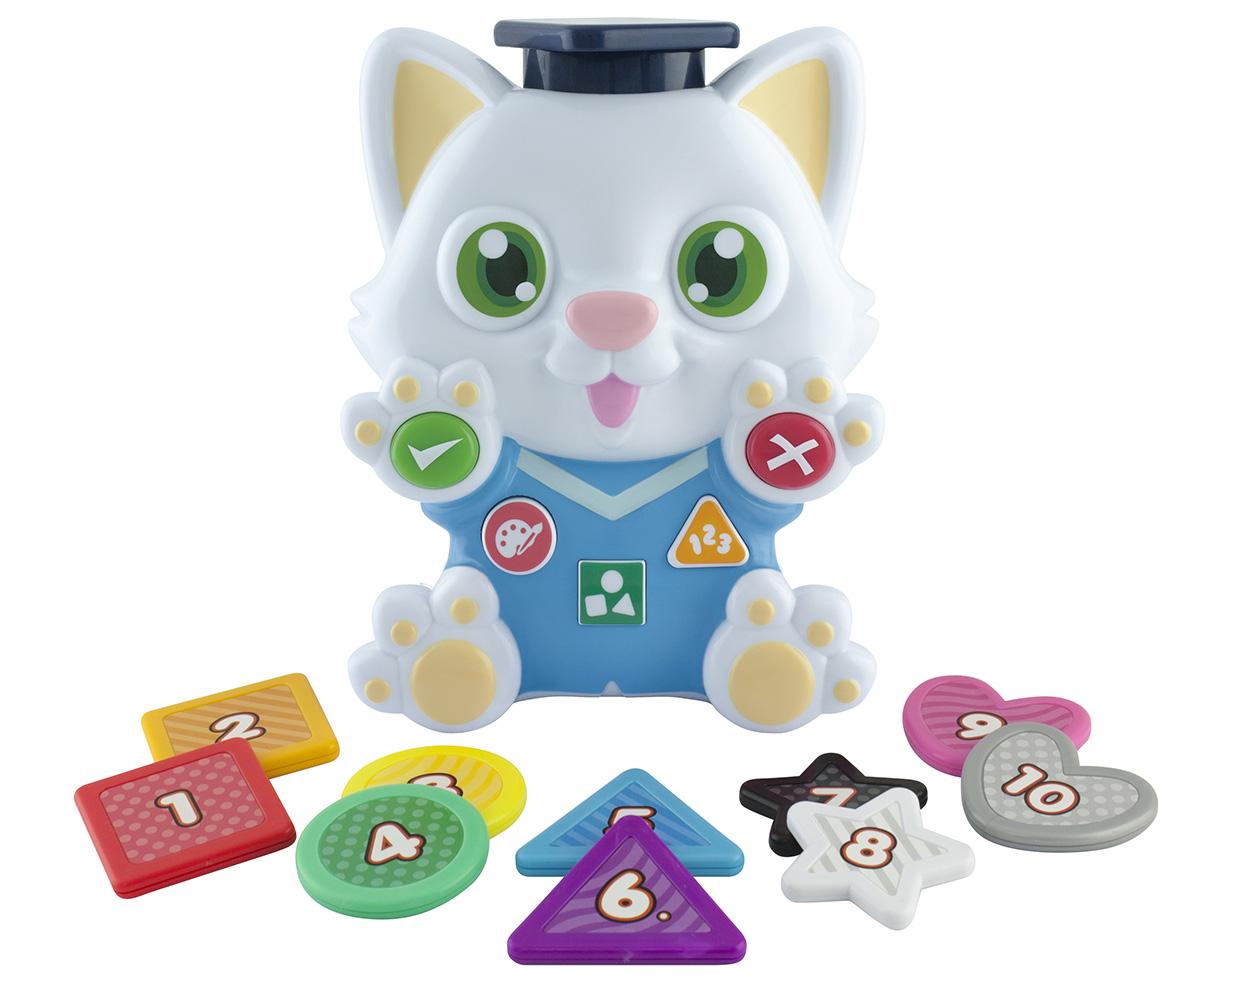 BabyLotte - 成長小伙伴系列 貓博士